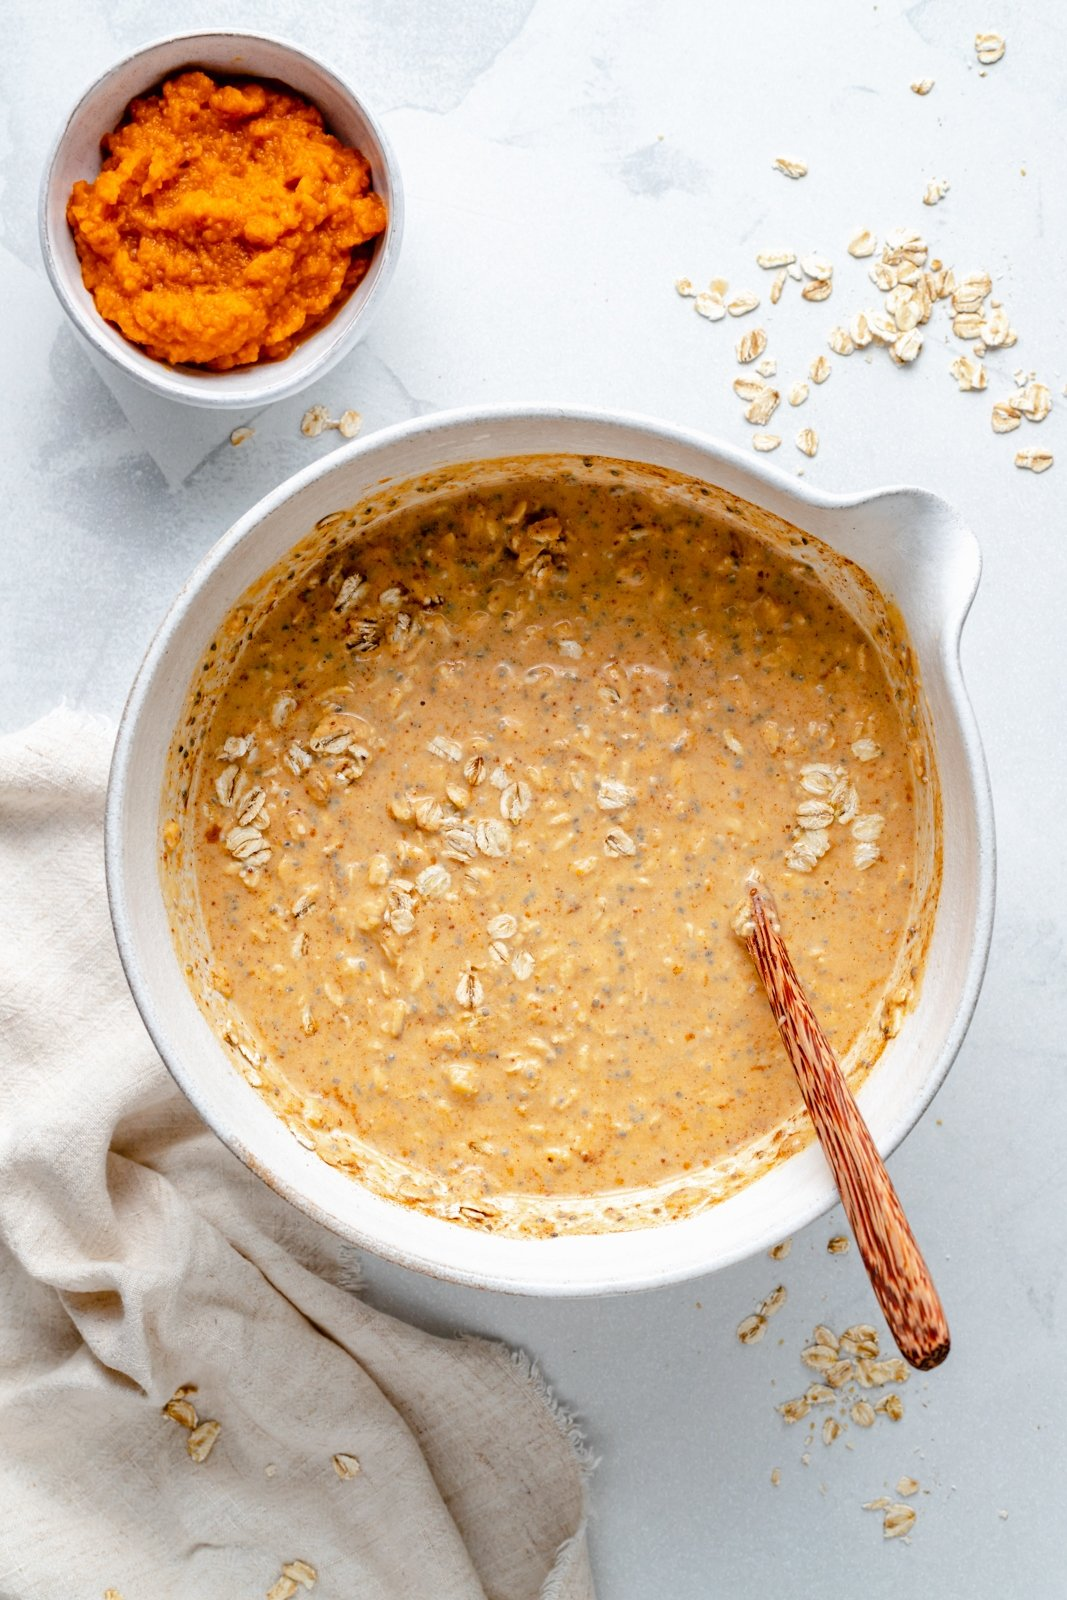 healthy pumpkin overnight oats in a bowl